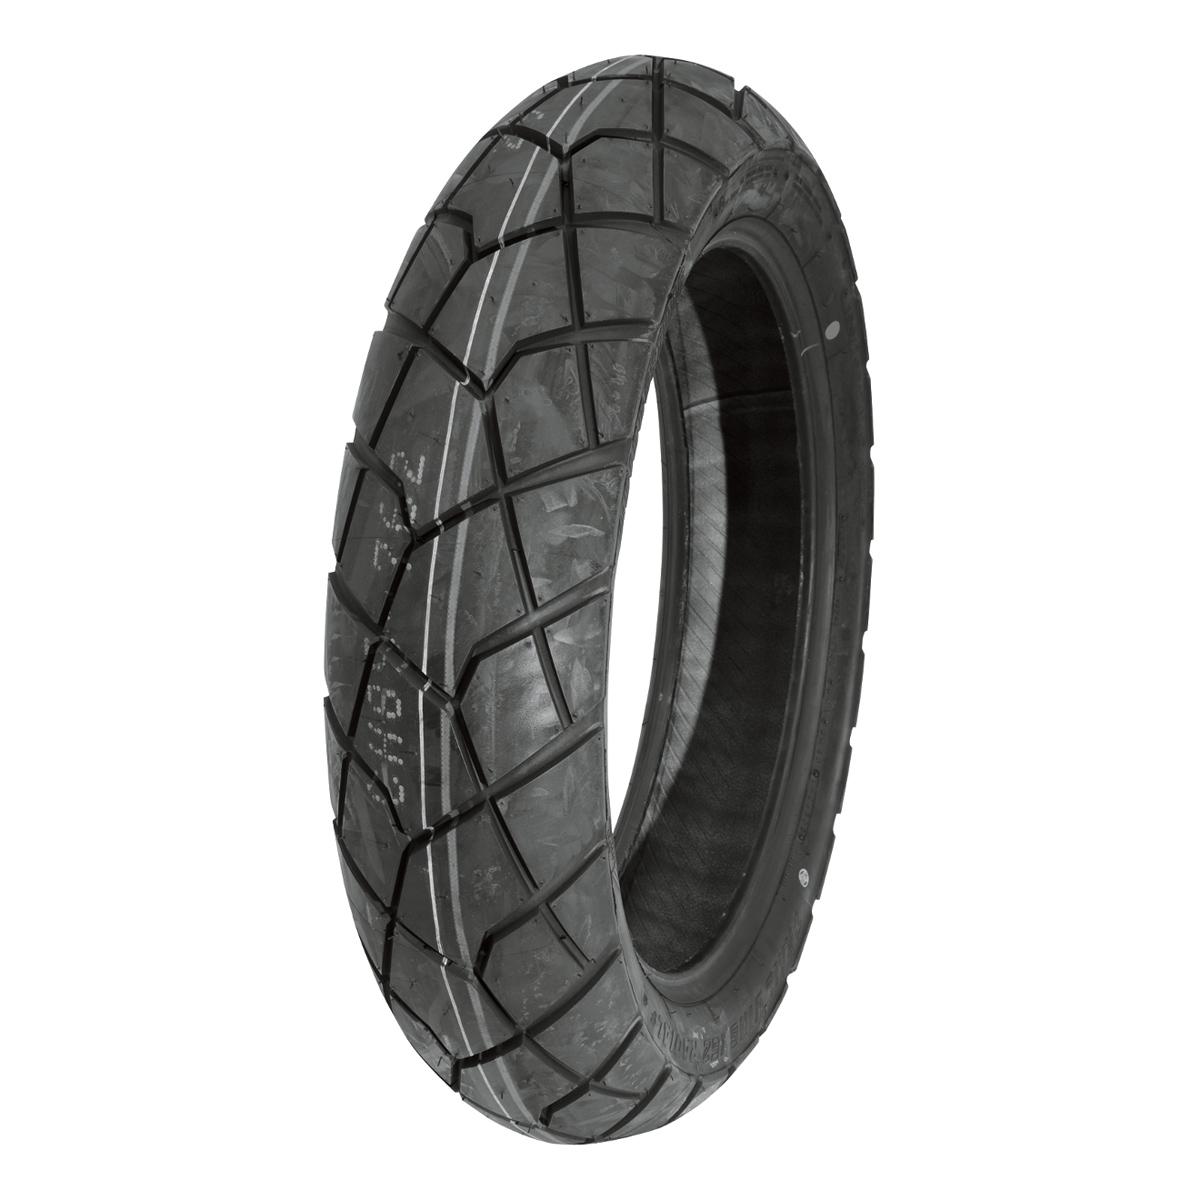 Bridgestone TW152-E 140/80R17 Rear Tire